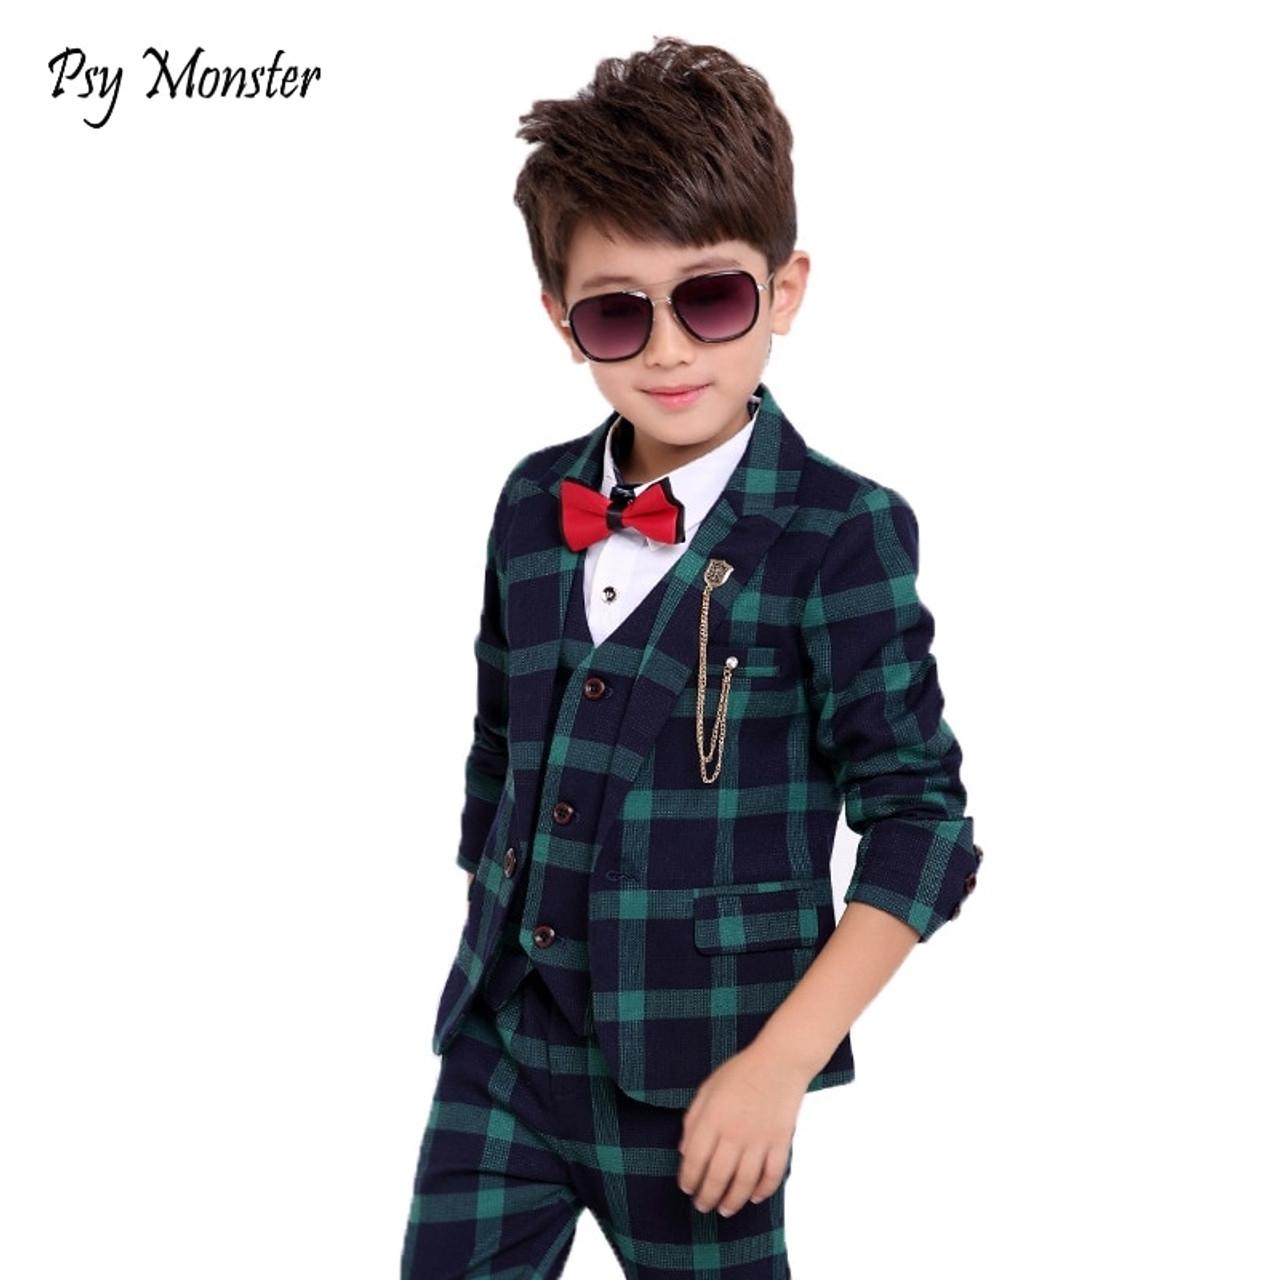 c4cd5997 ... Flower Boys Formal School Suits for Weddings Boys Brand Plaid Blazer  Vest Pants 3pcs Tuxedo Kids ...